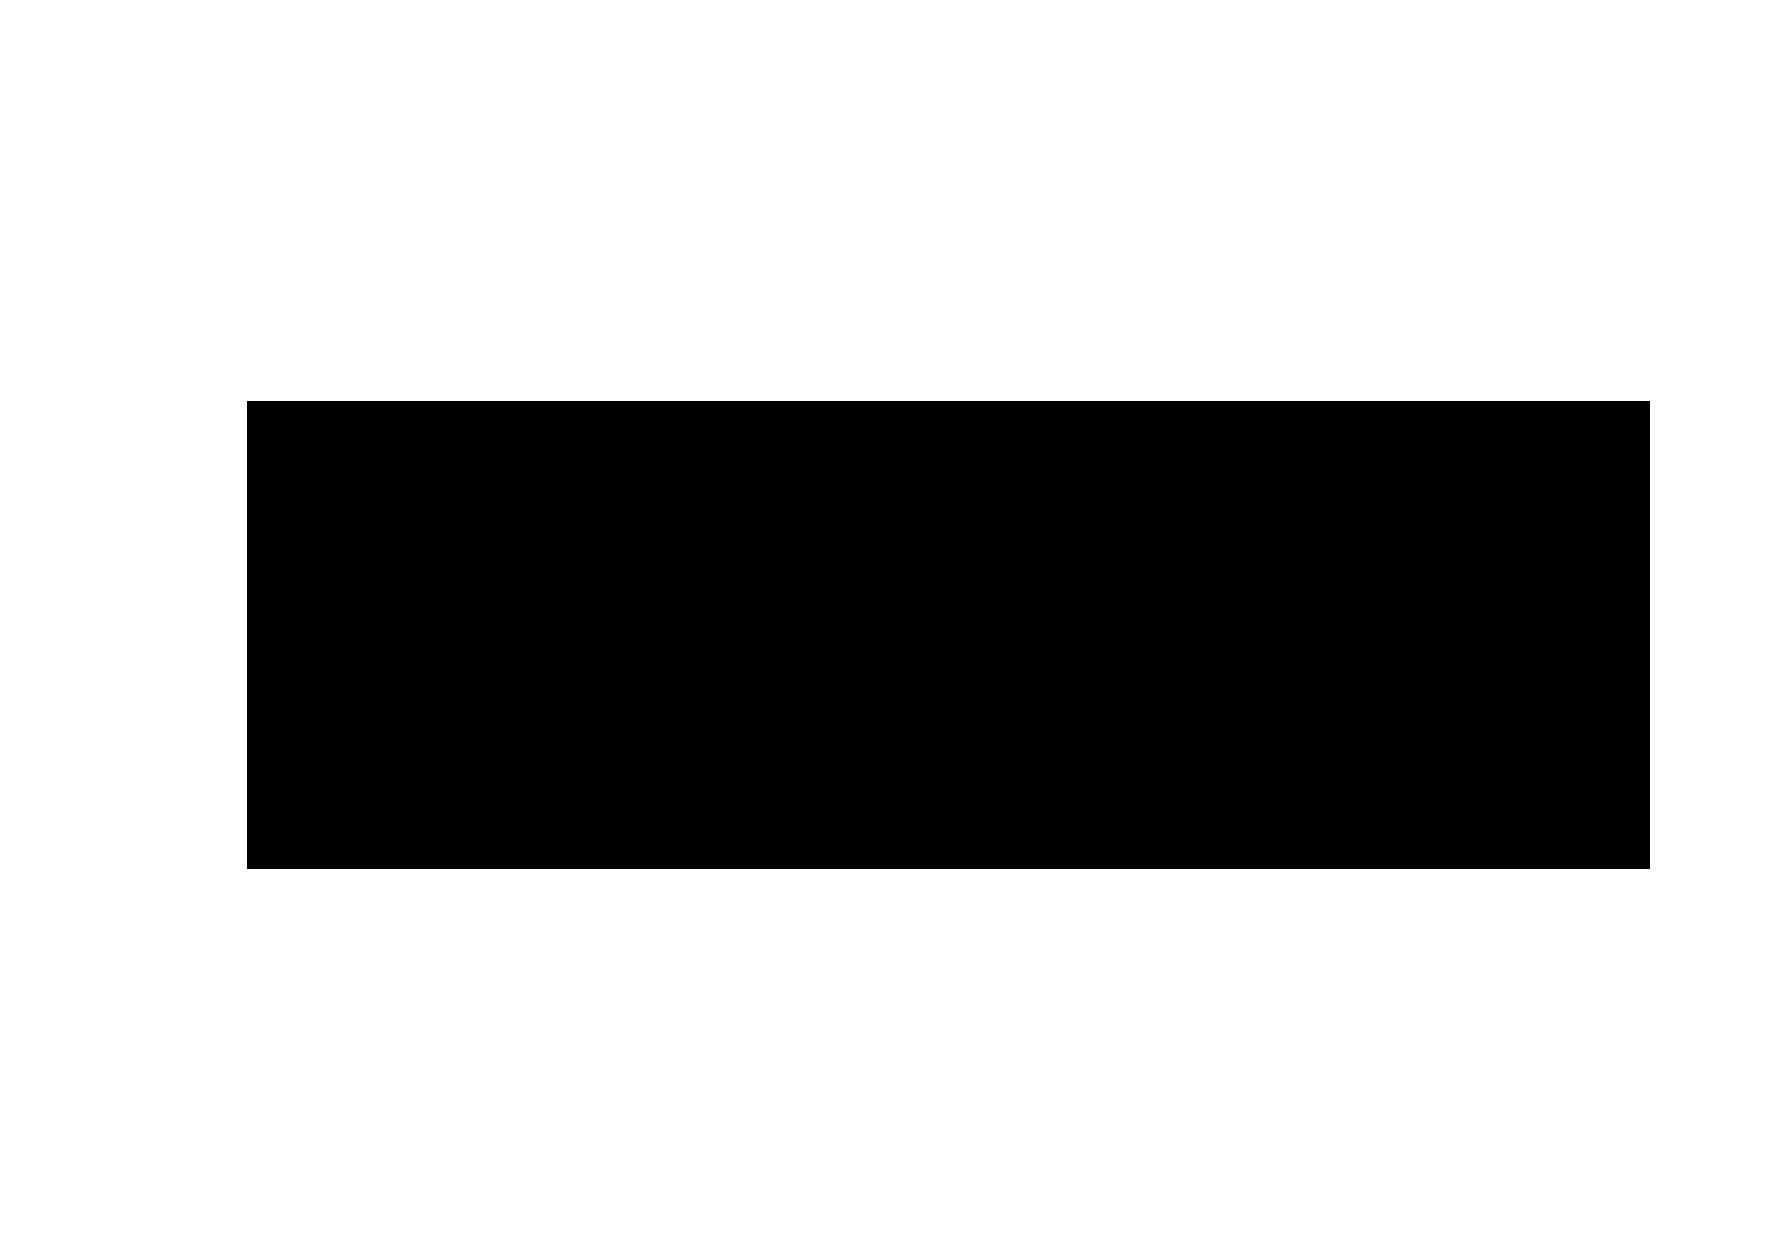 مخطوطه رمضان كريم مفرغه 2 15 مخطوطه لشهر رمضان بالخط الحر png